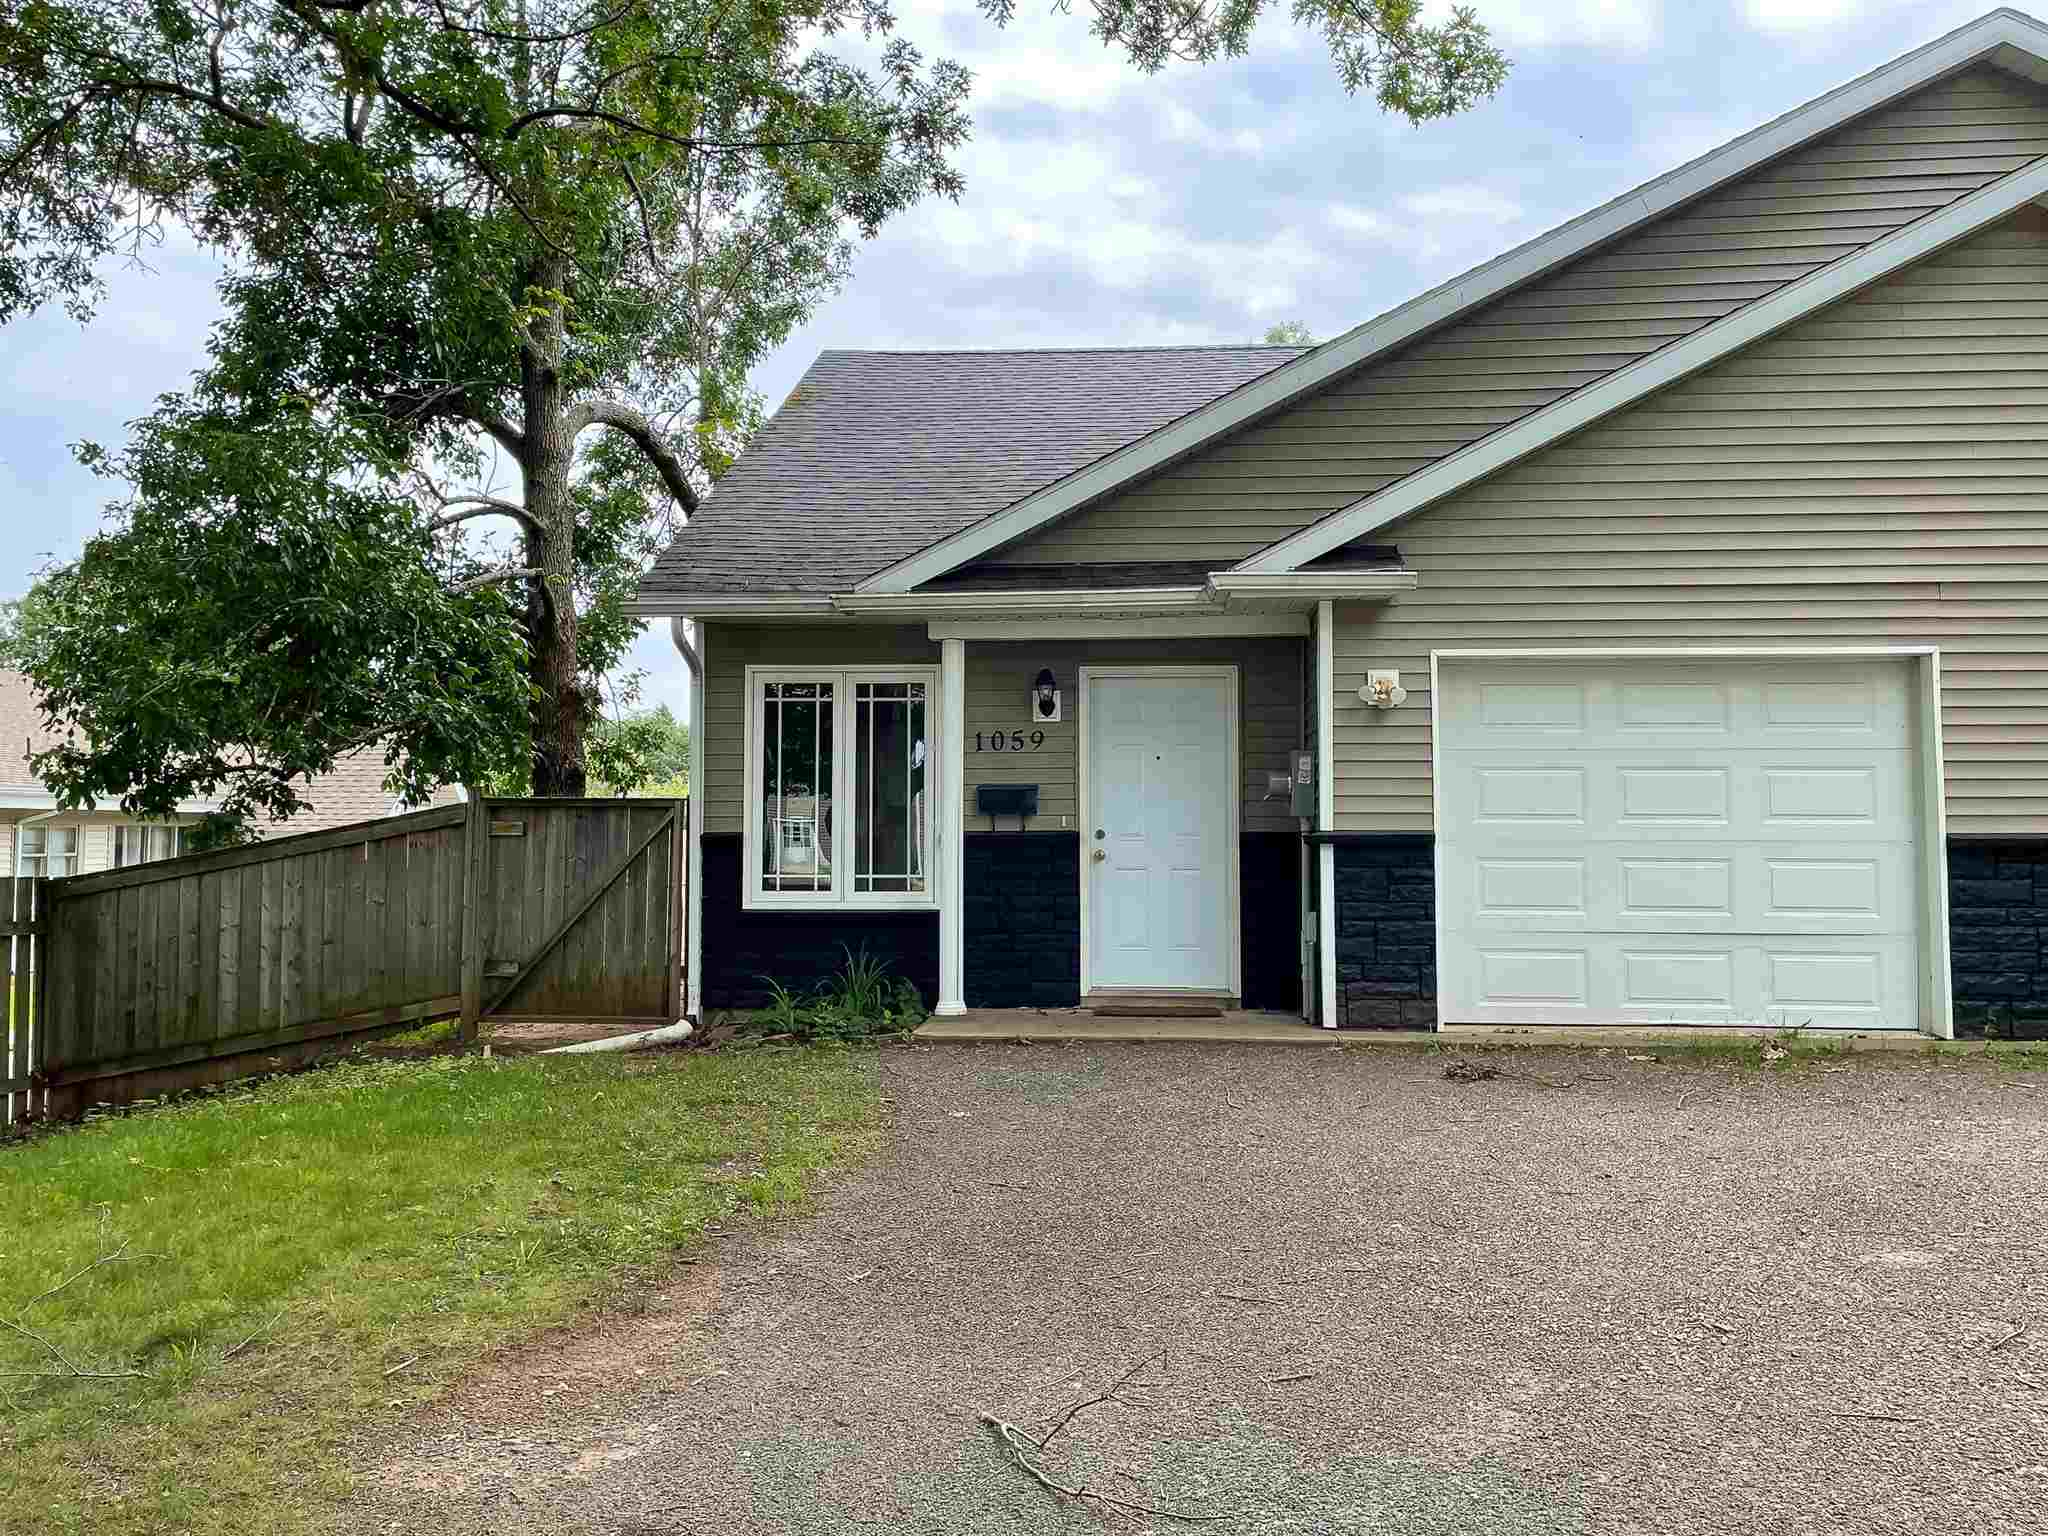 1059 Scott Drive, North Kentville, Nova Scotia, Canada